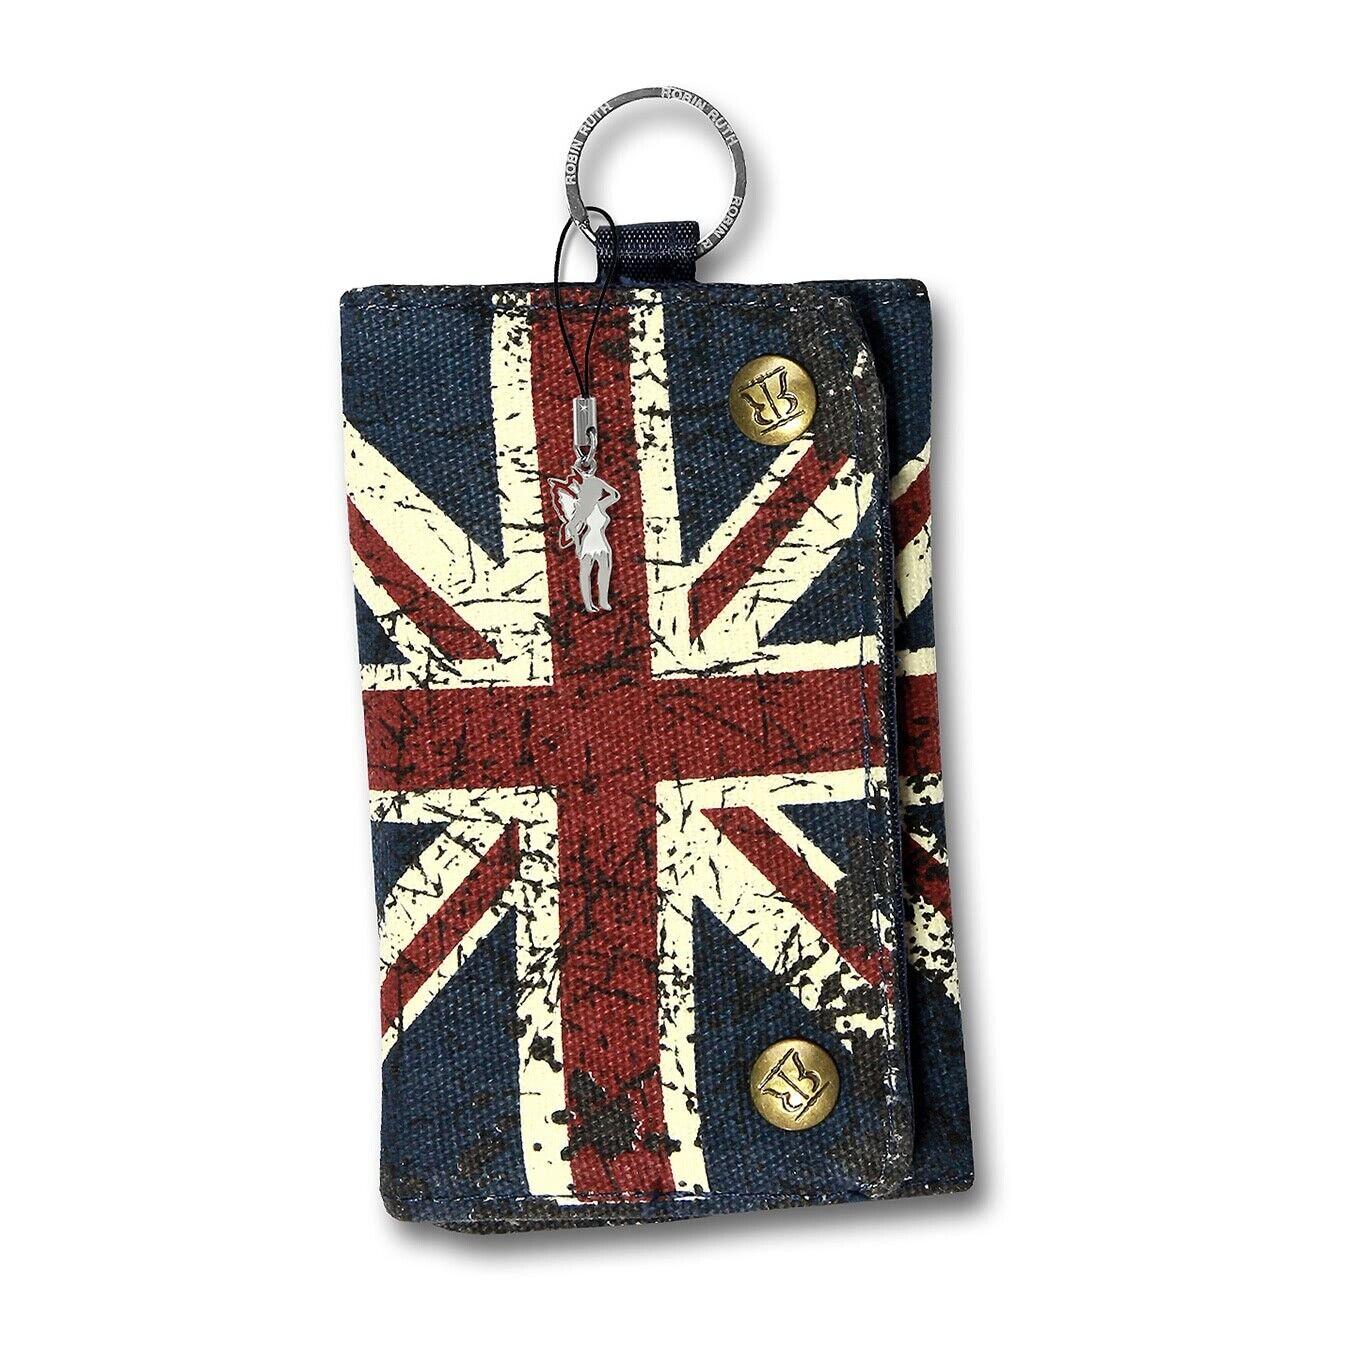 Robin RUTH CANVAS Matte Wallet Mini Purse Blue Union Jack Wallet OPG100F